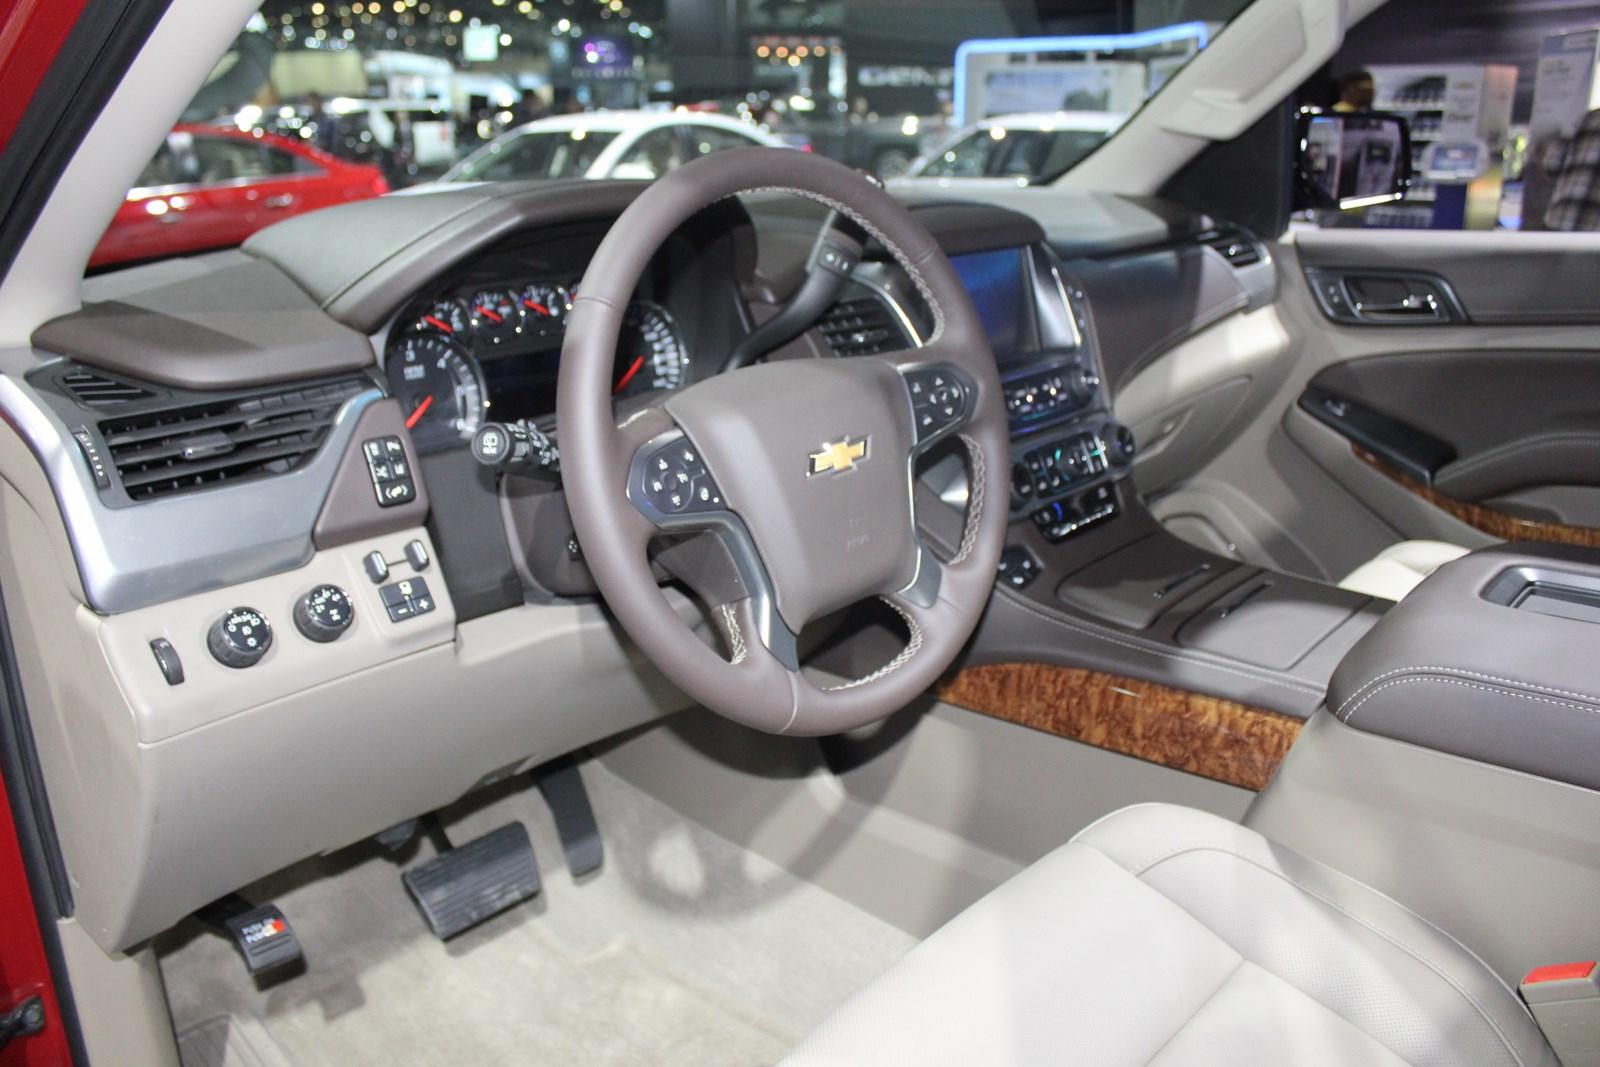 2015 Chevrolet Tahoe breaks cover at 2013 LA Auto Show